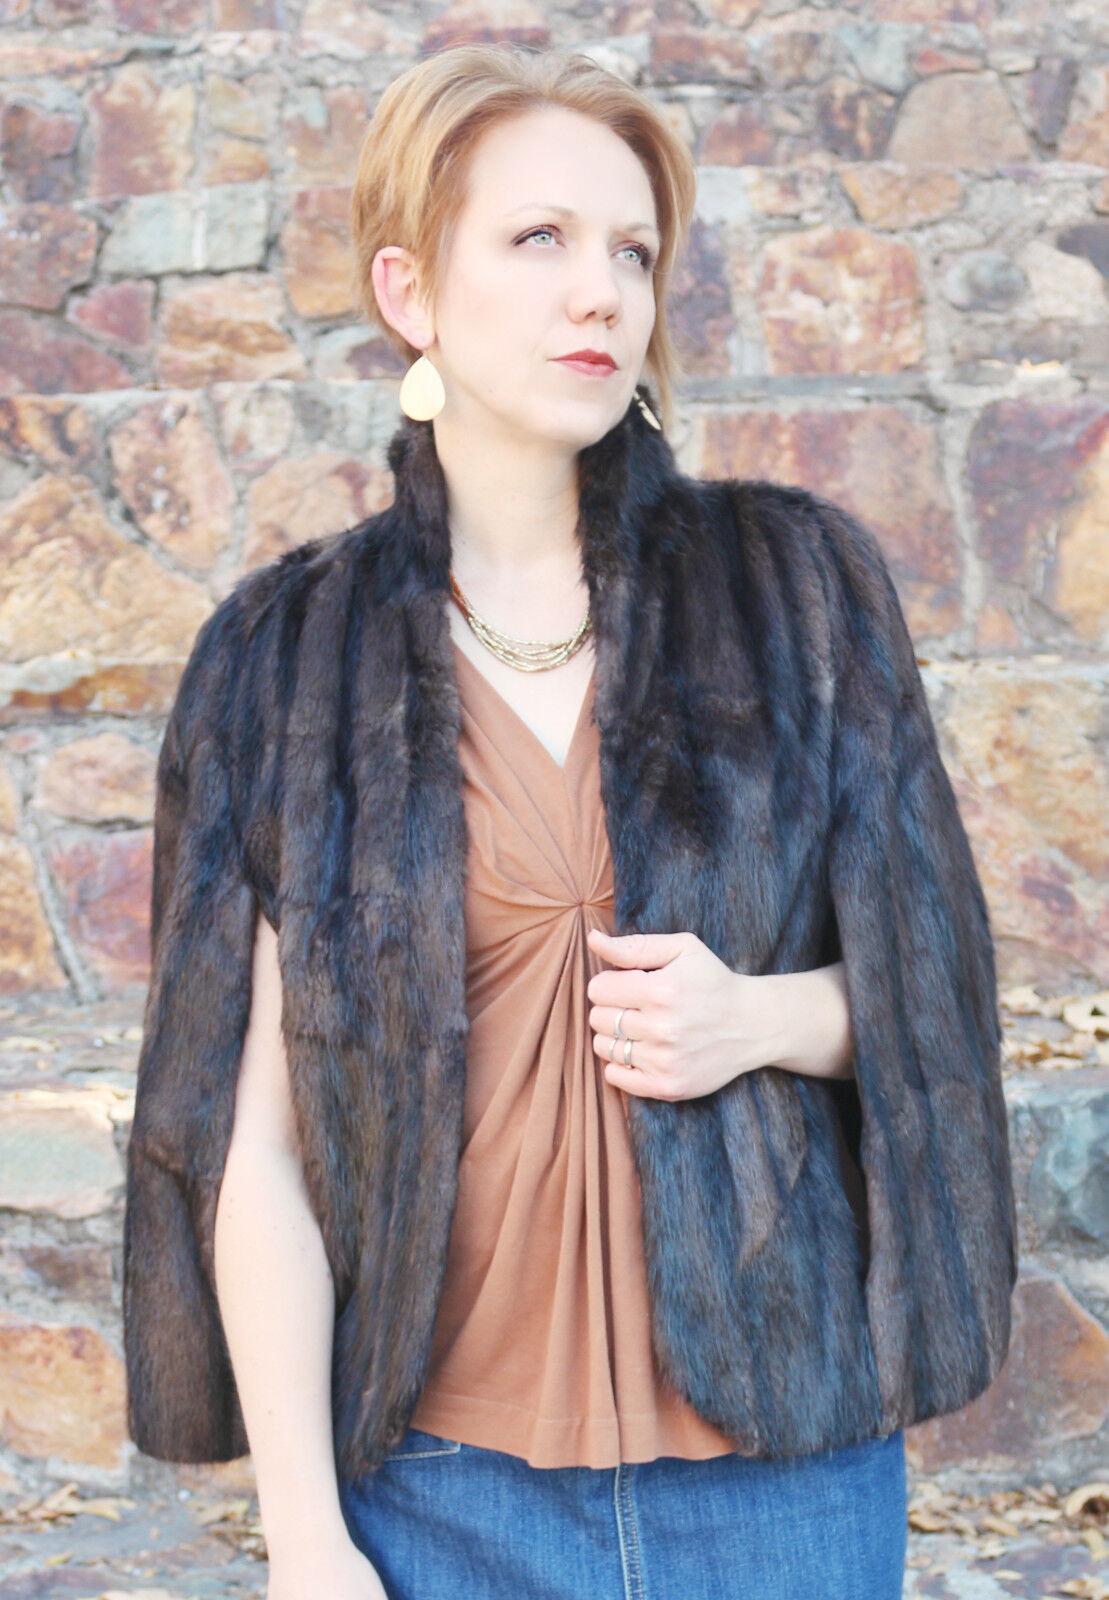 VINTAGE RACOON CAPE Women's or Fur Coat Custom Size {S. Hessner} EXCELLENT!